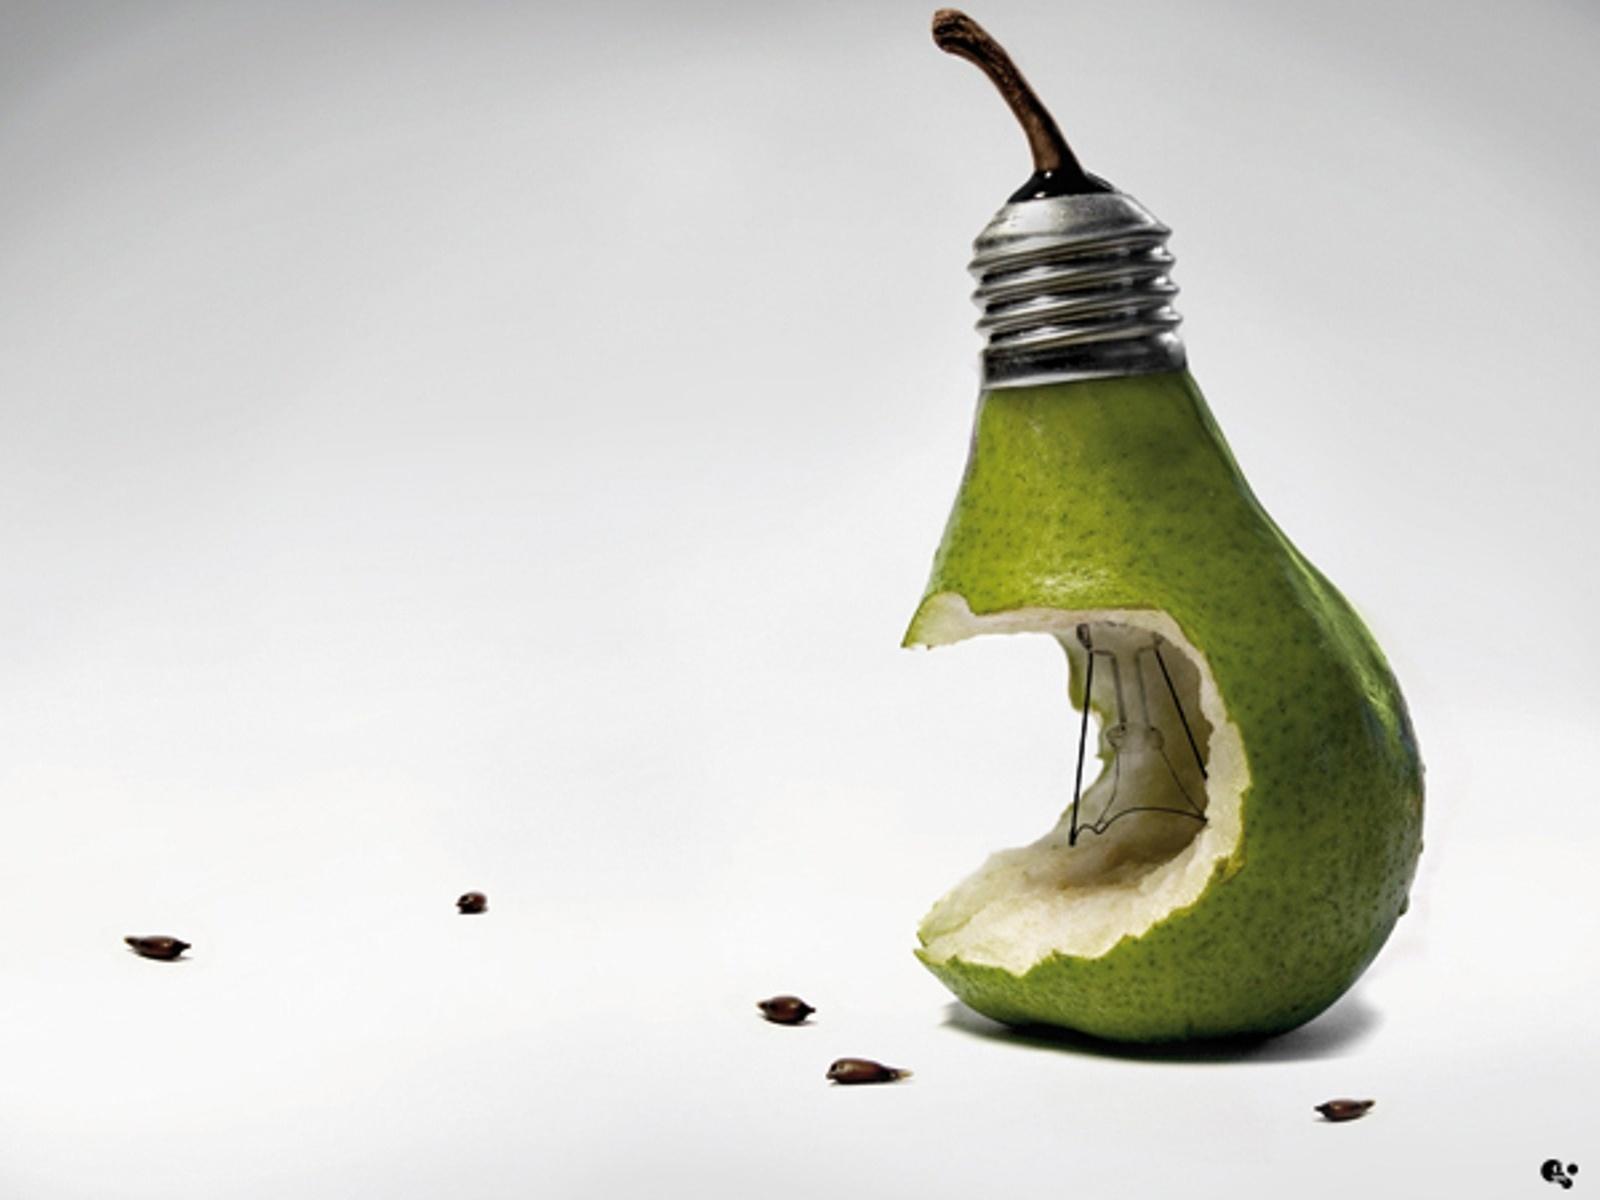 надкусанная груша, лампочка, скачать фото